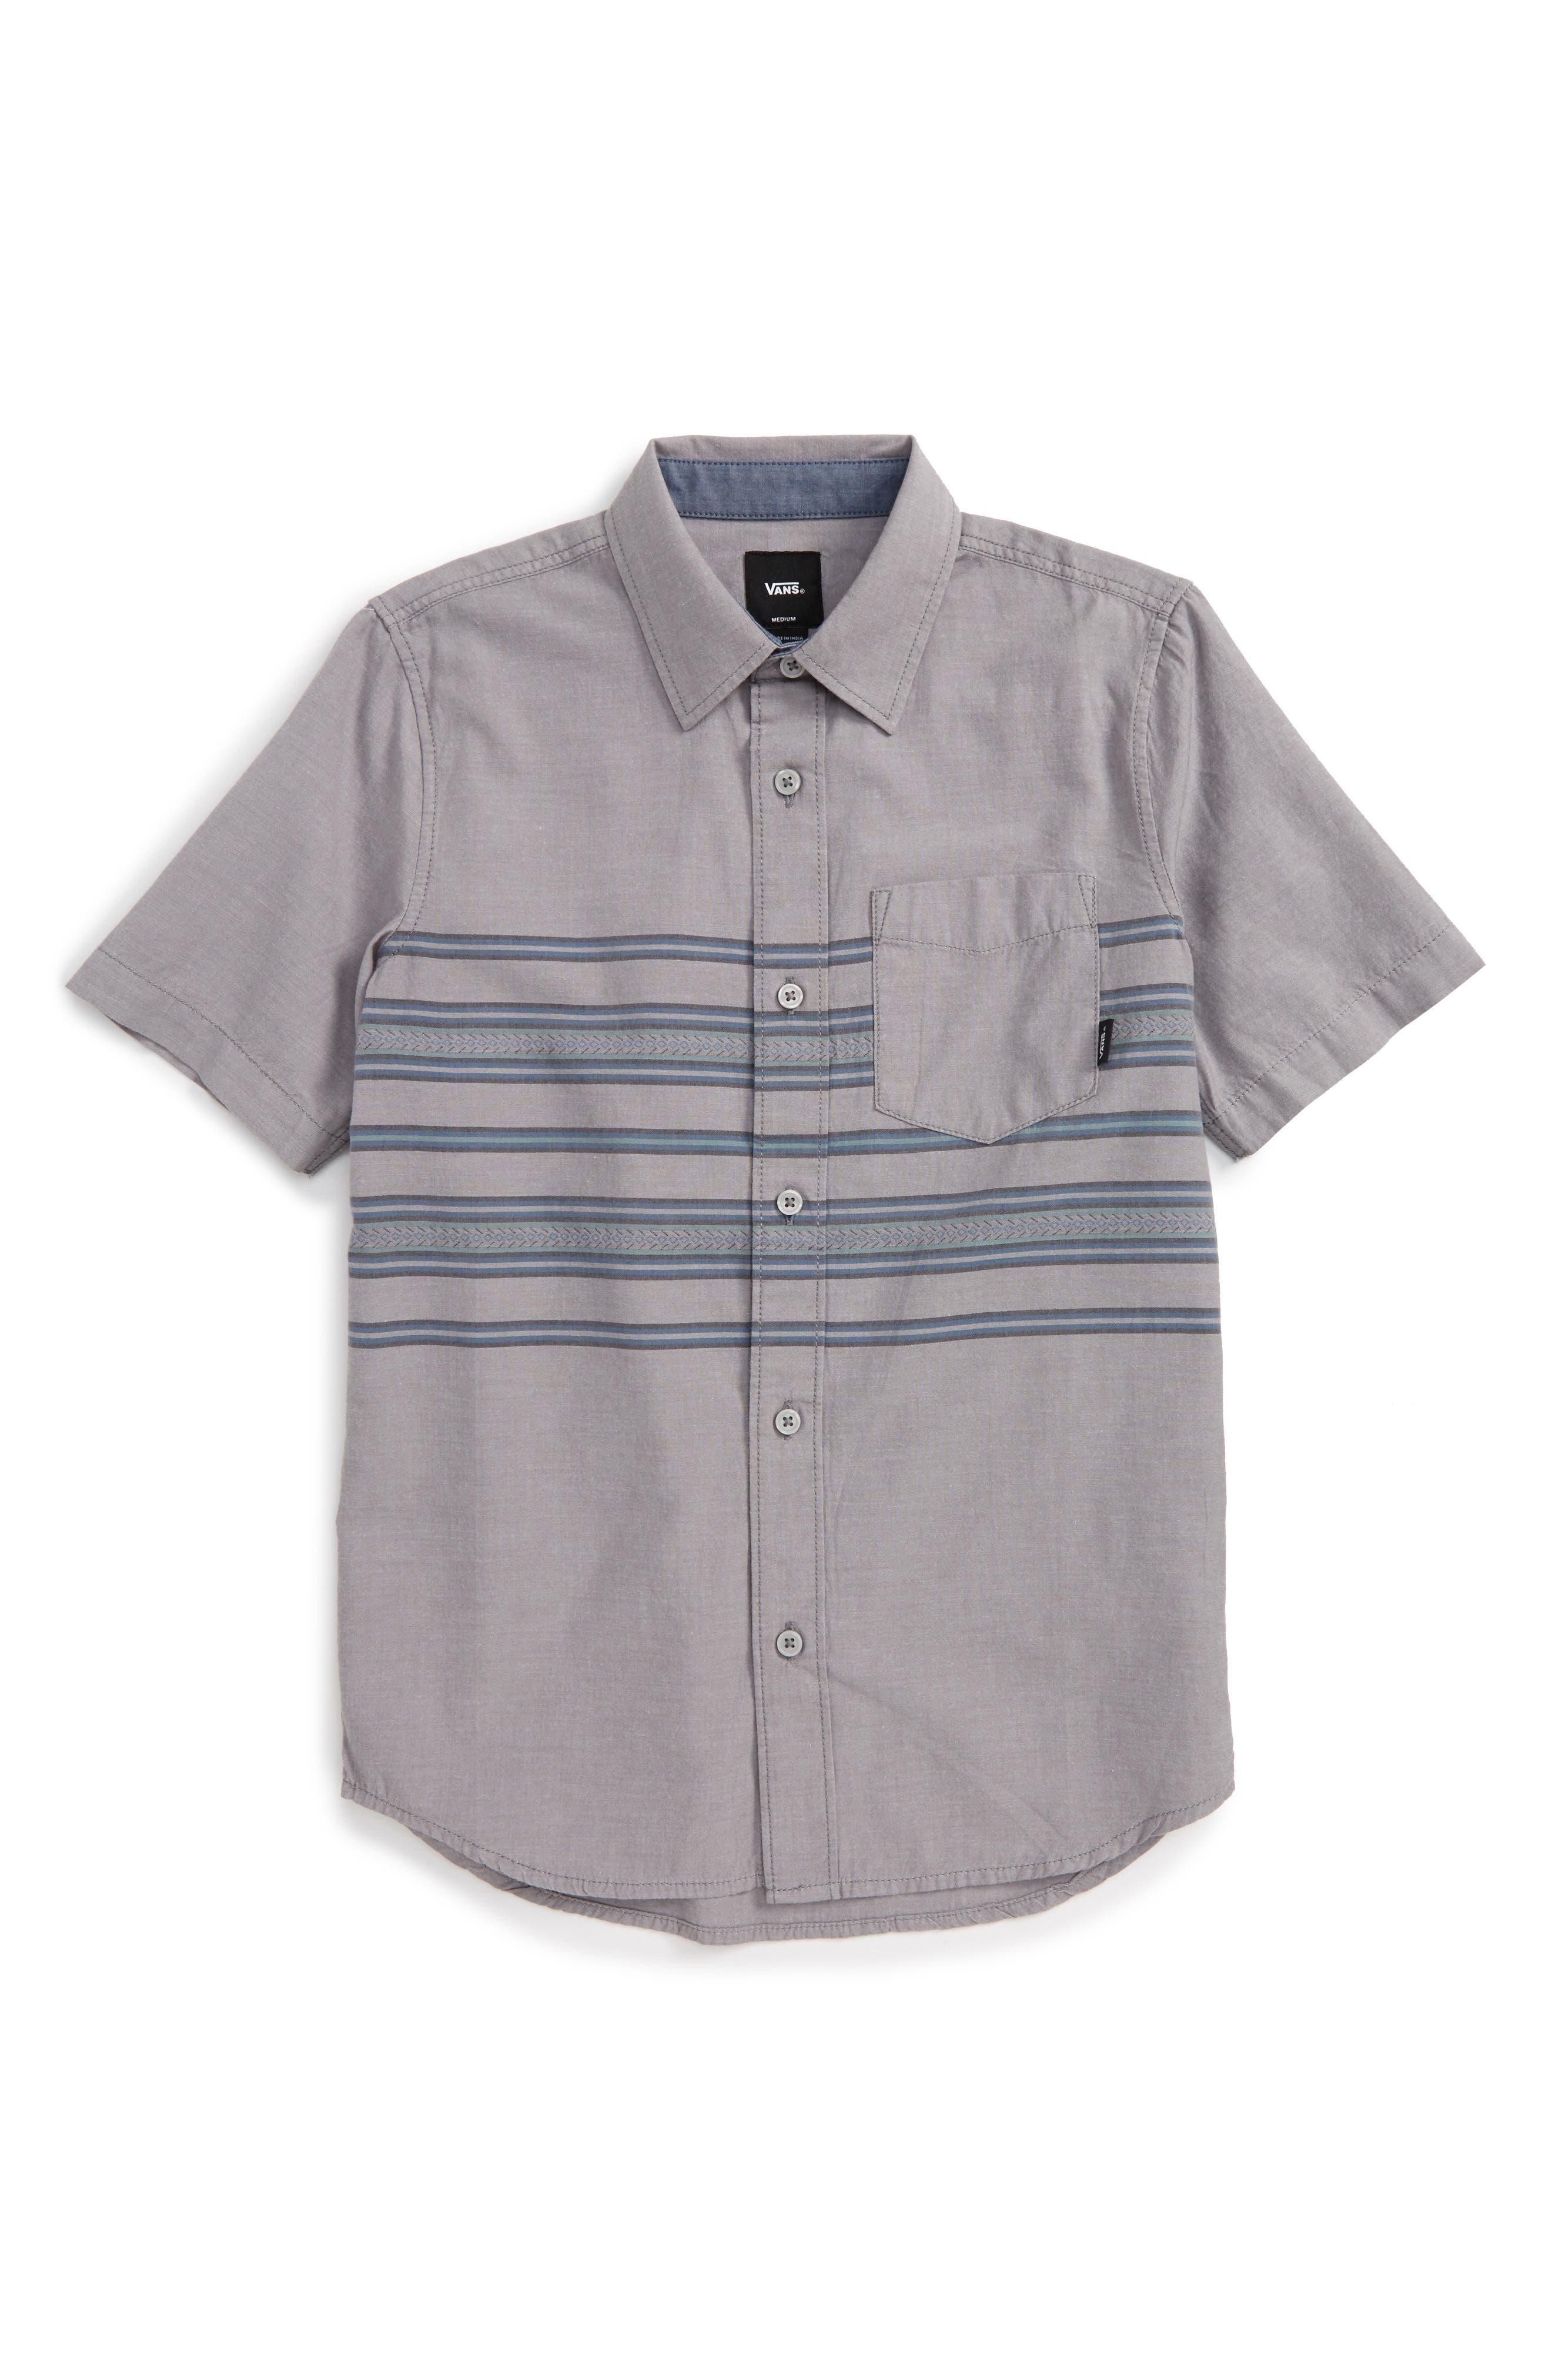 Vans Benmore Woven Shirt (Big Boys)